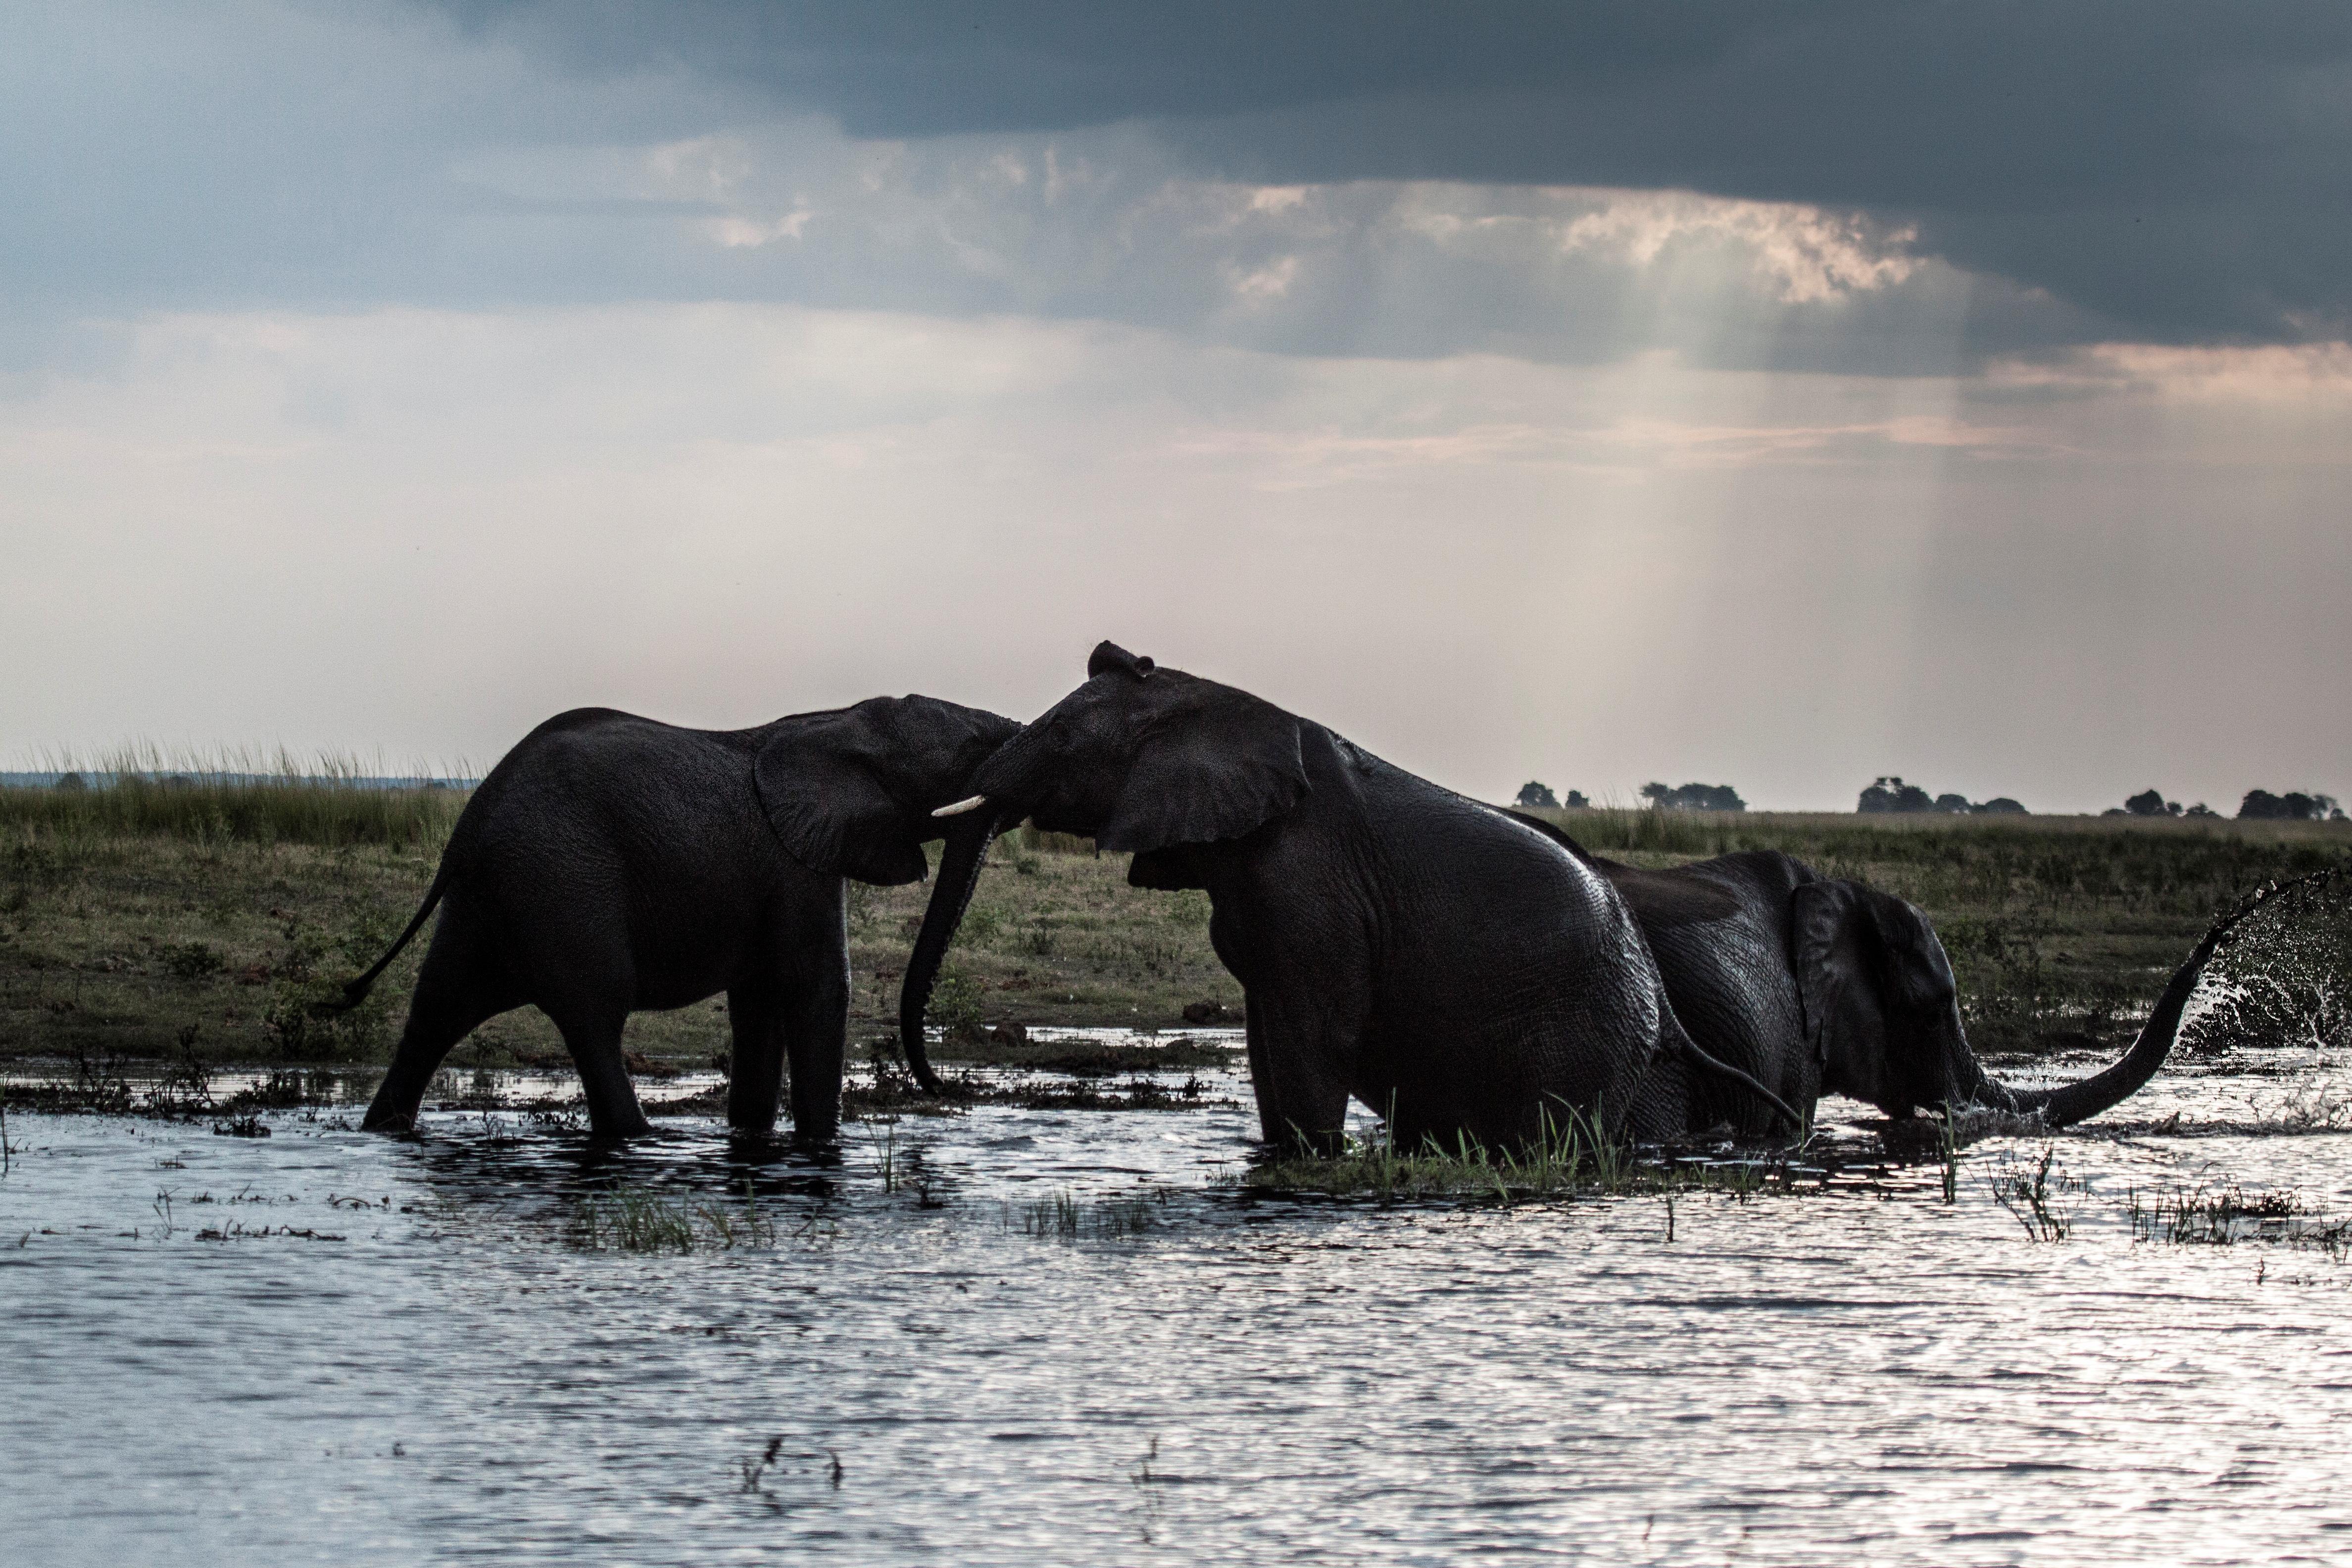 Elefantes en Botsuana | Chris Jek | Agence France-Presse